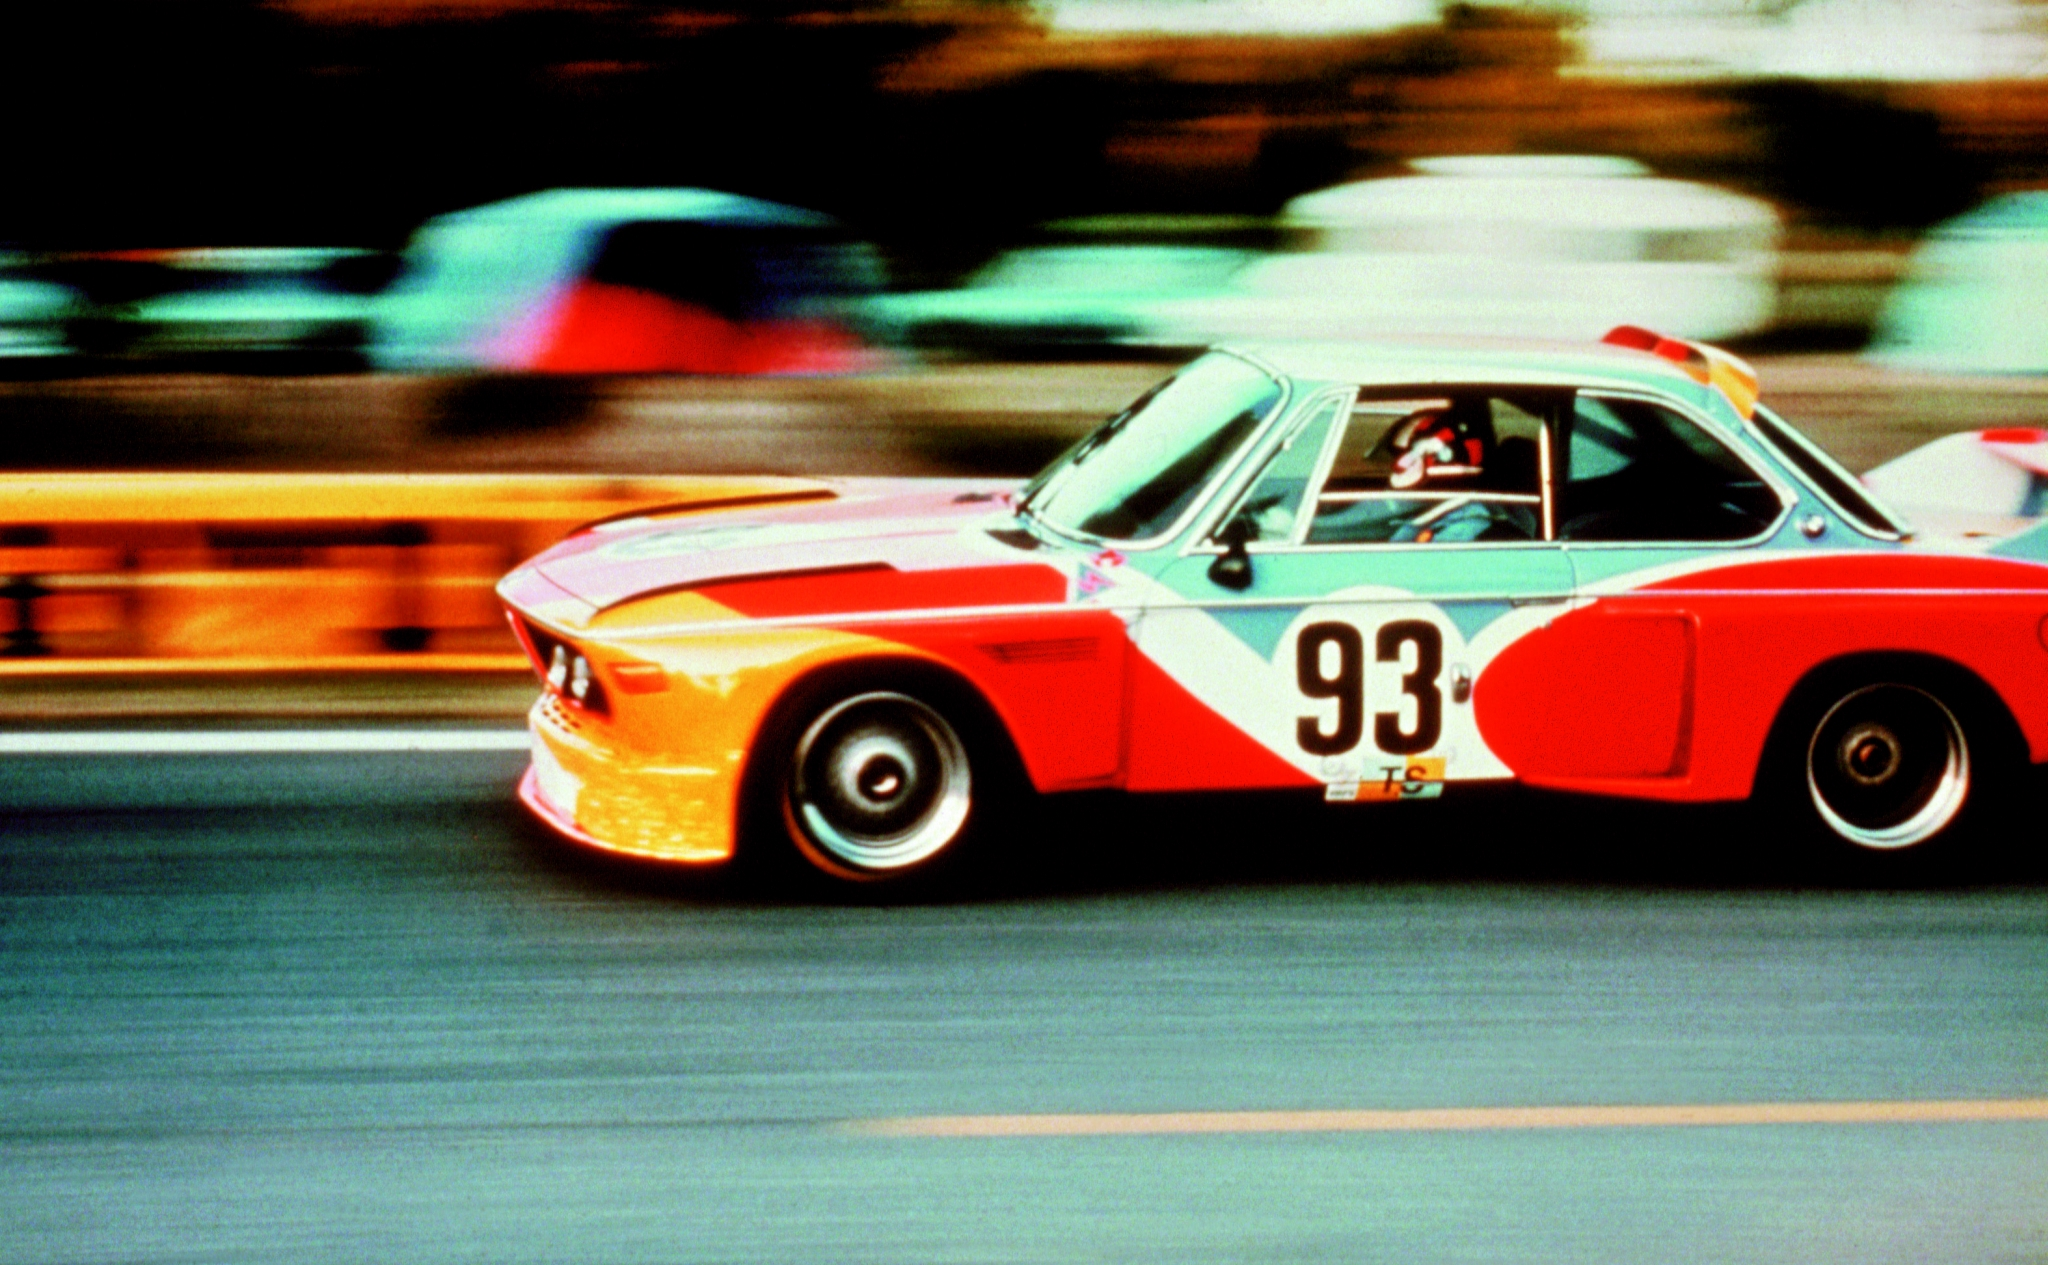 BMW Alexander Calder, Art Car, 1975 - BMW 3.0 CSL